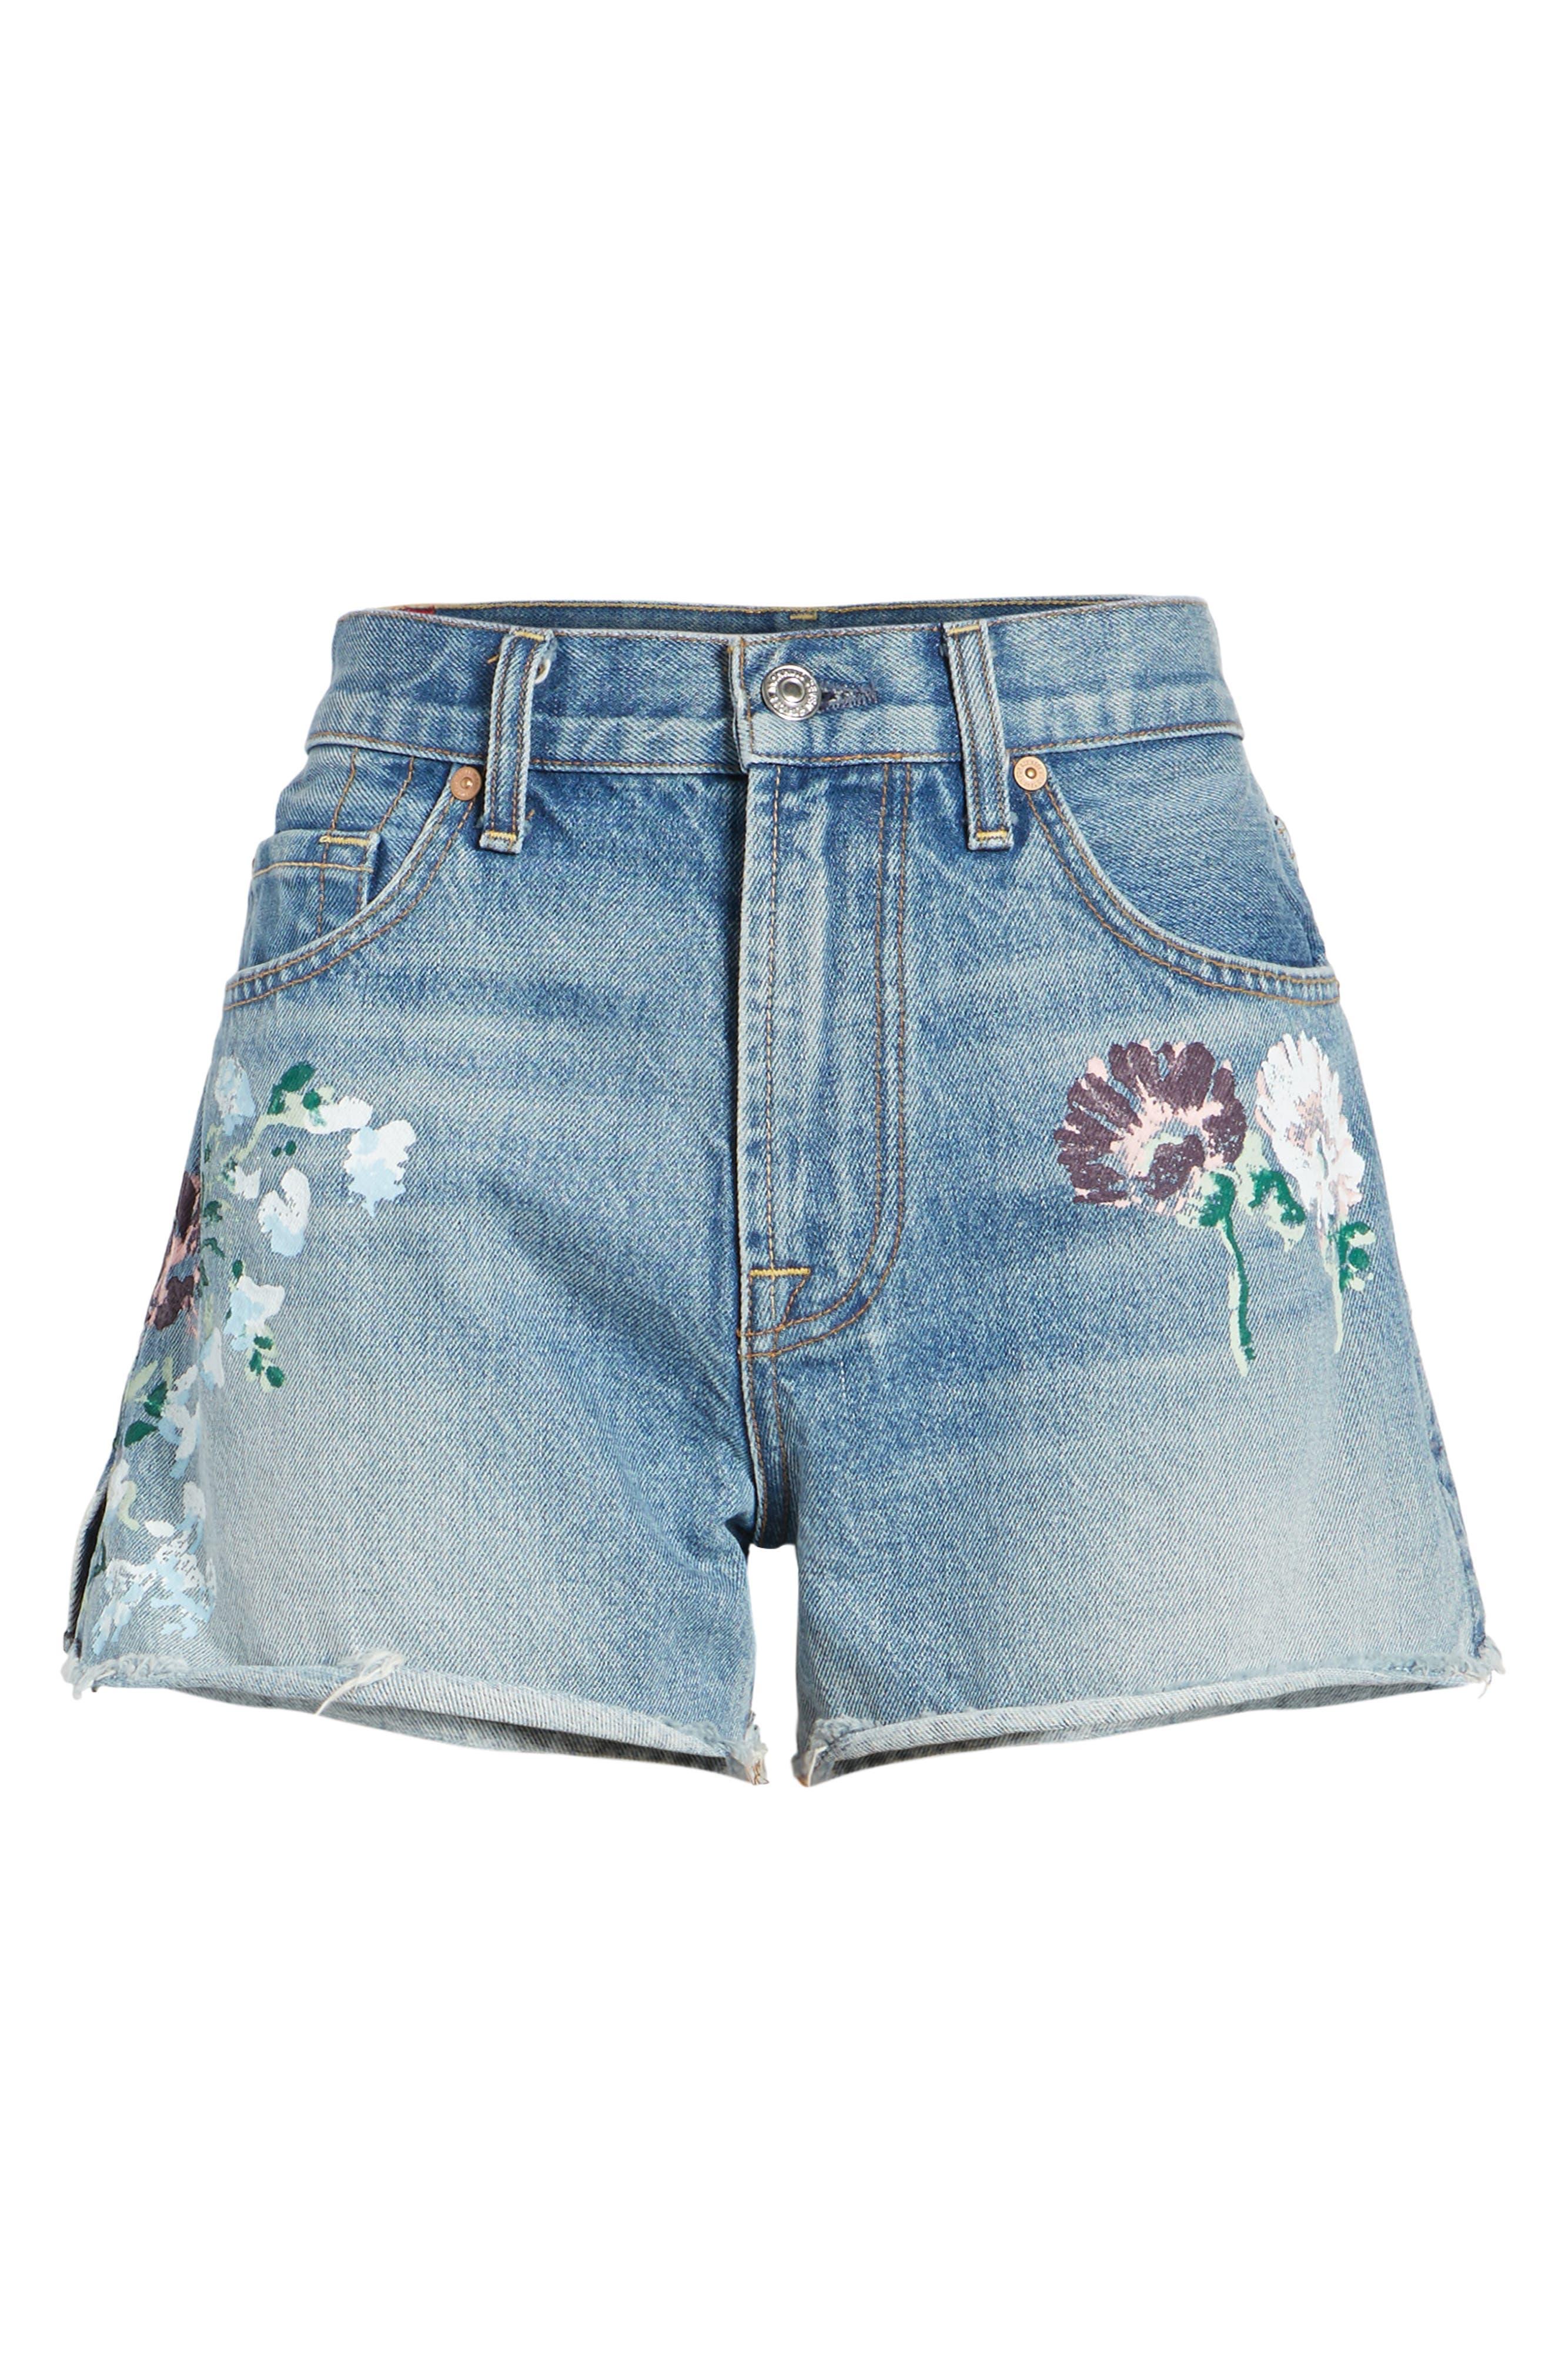 Handpainted Cutoff Denim Shorts,                             Alternate thumbnail 6, color,                             Vintage Wythe Painted Floral